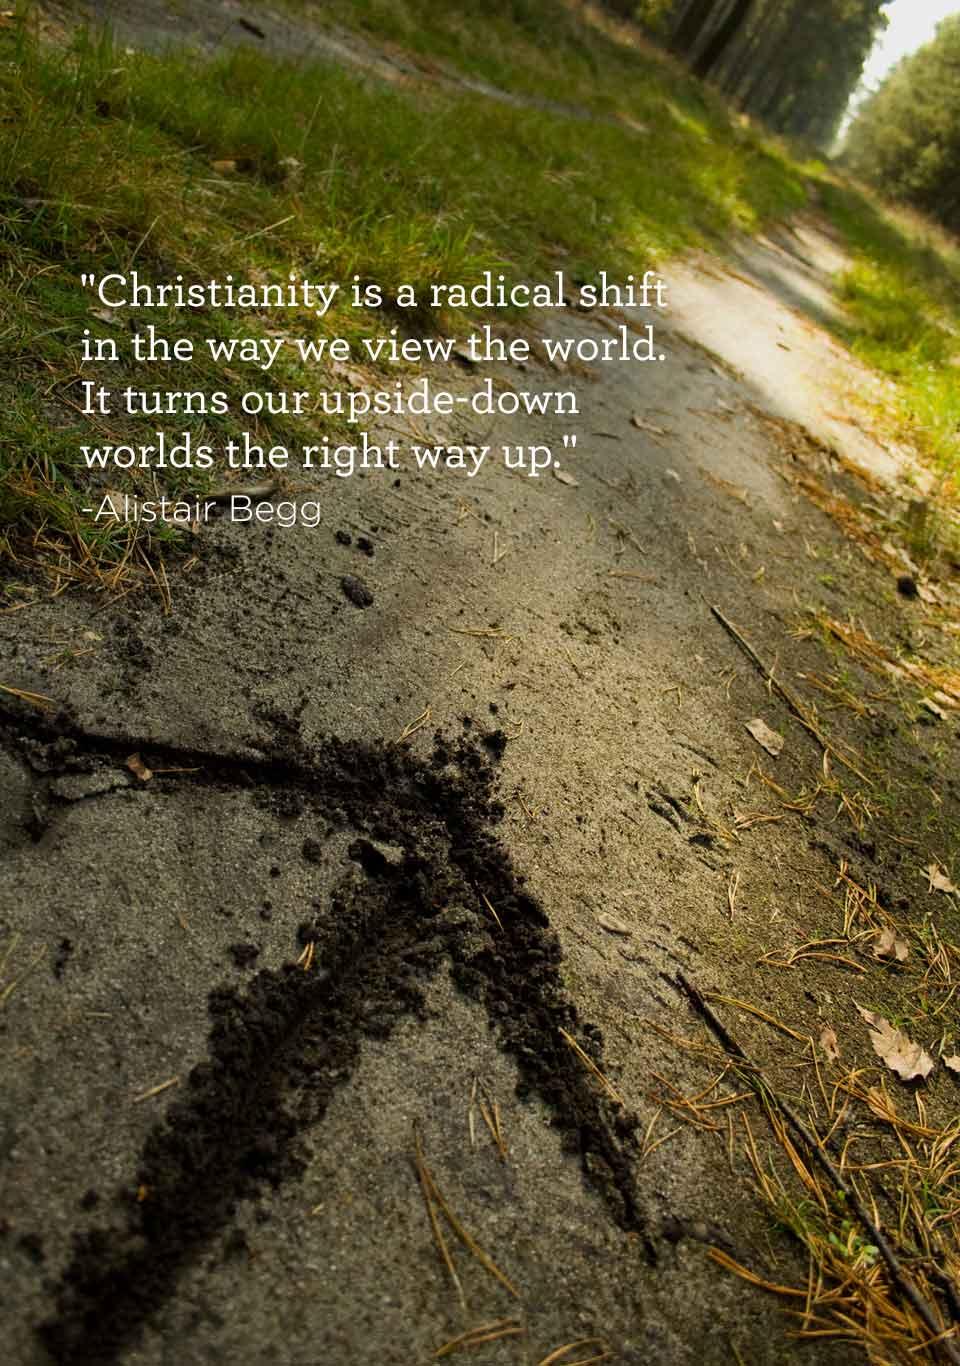 thumbnail image for A Radical Shift